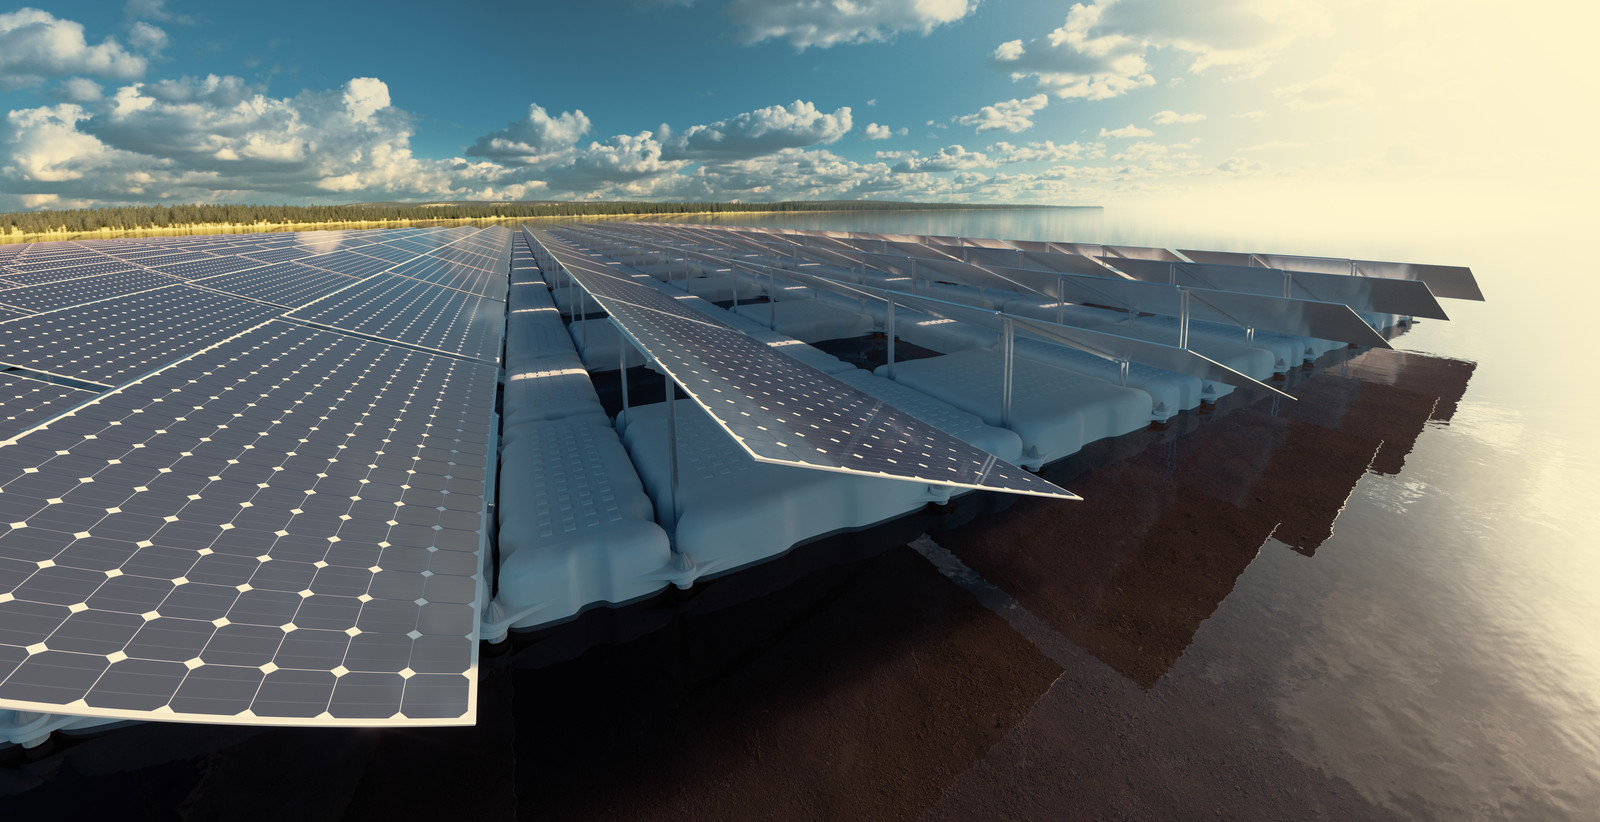 Ter illustratie: drijvende zonnepanelen.